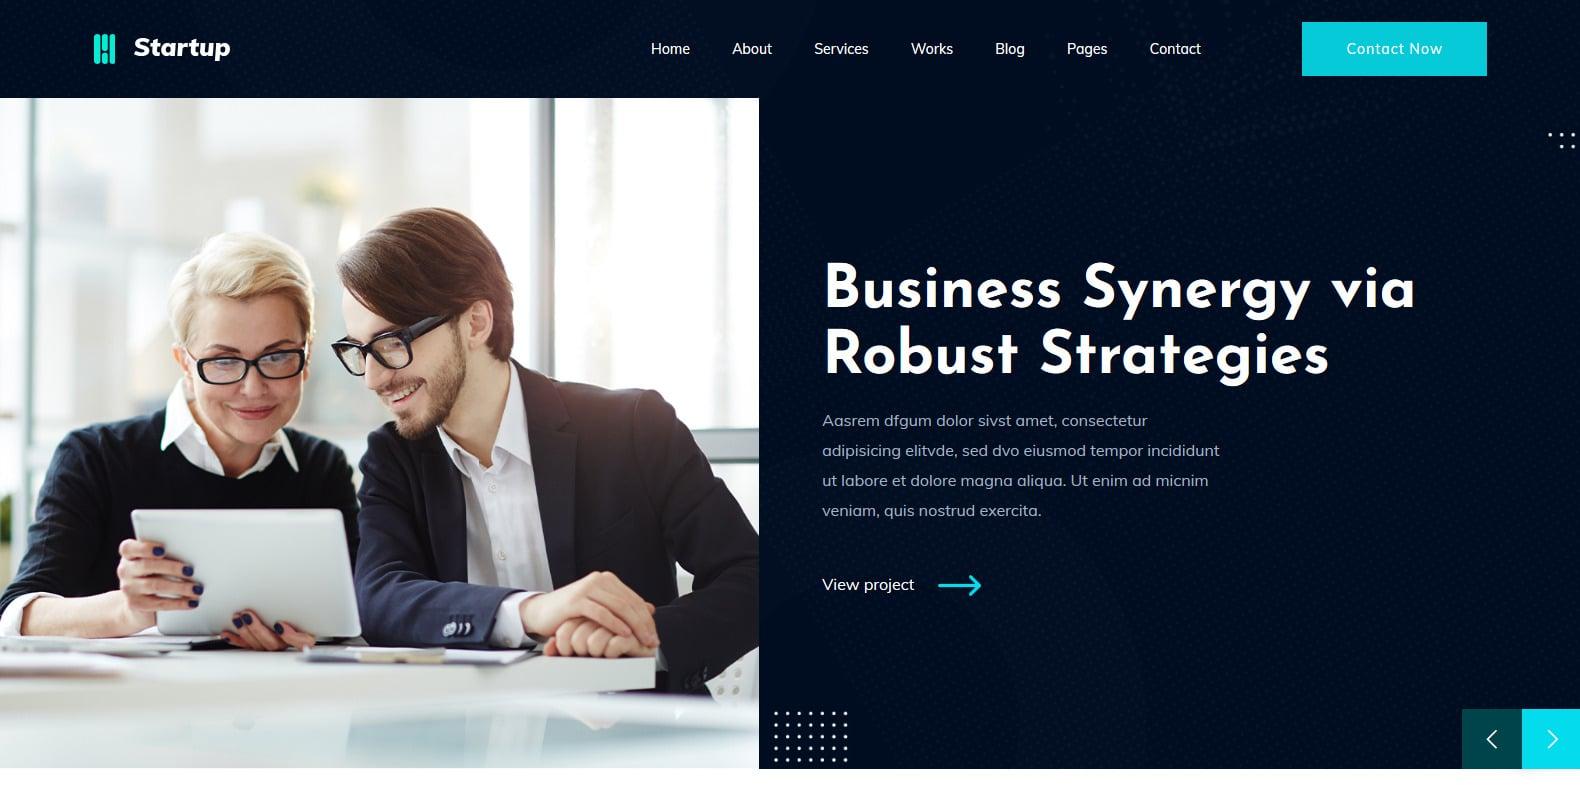 startupbusiness-startup-website-template